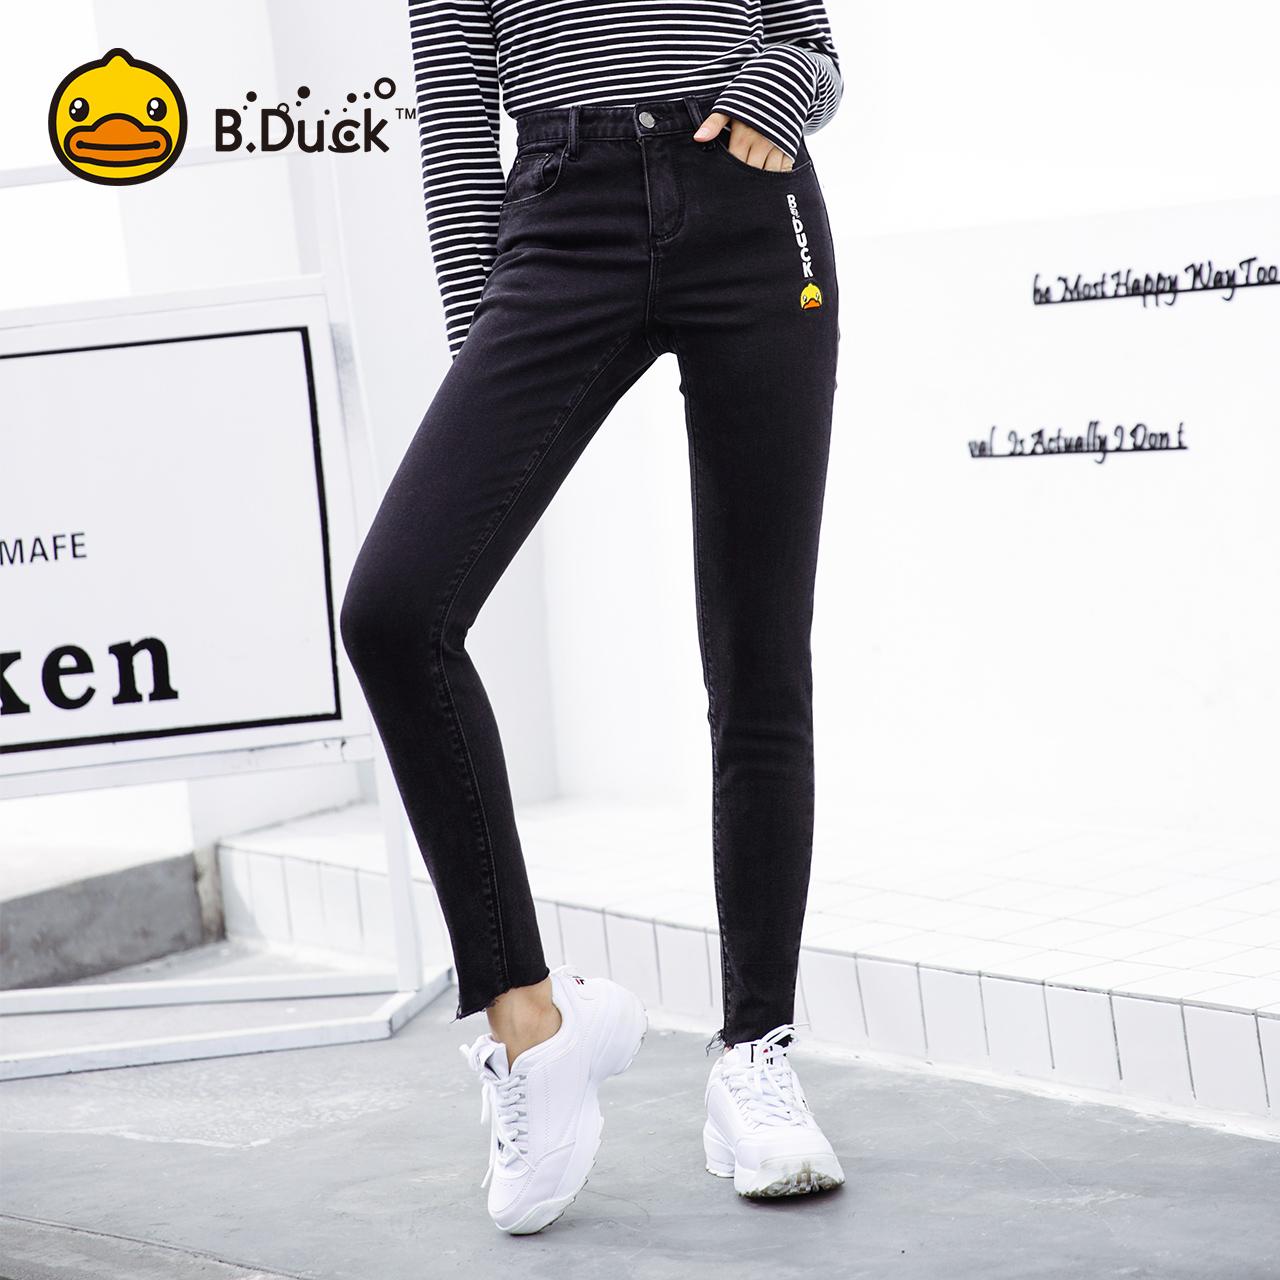 B.Duck小黄鸭女装2018秋季新款修身高腰显瘦牛仔裤女小脚裤长裤子